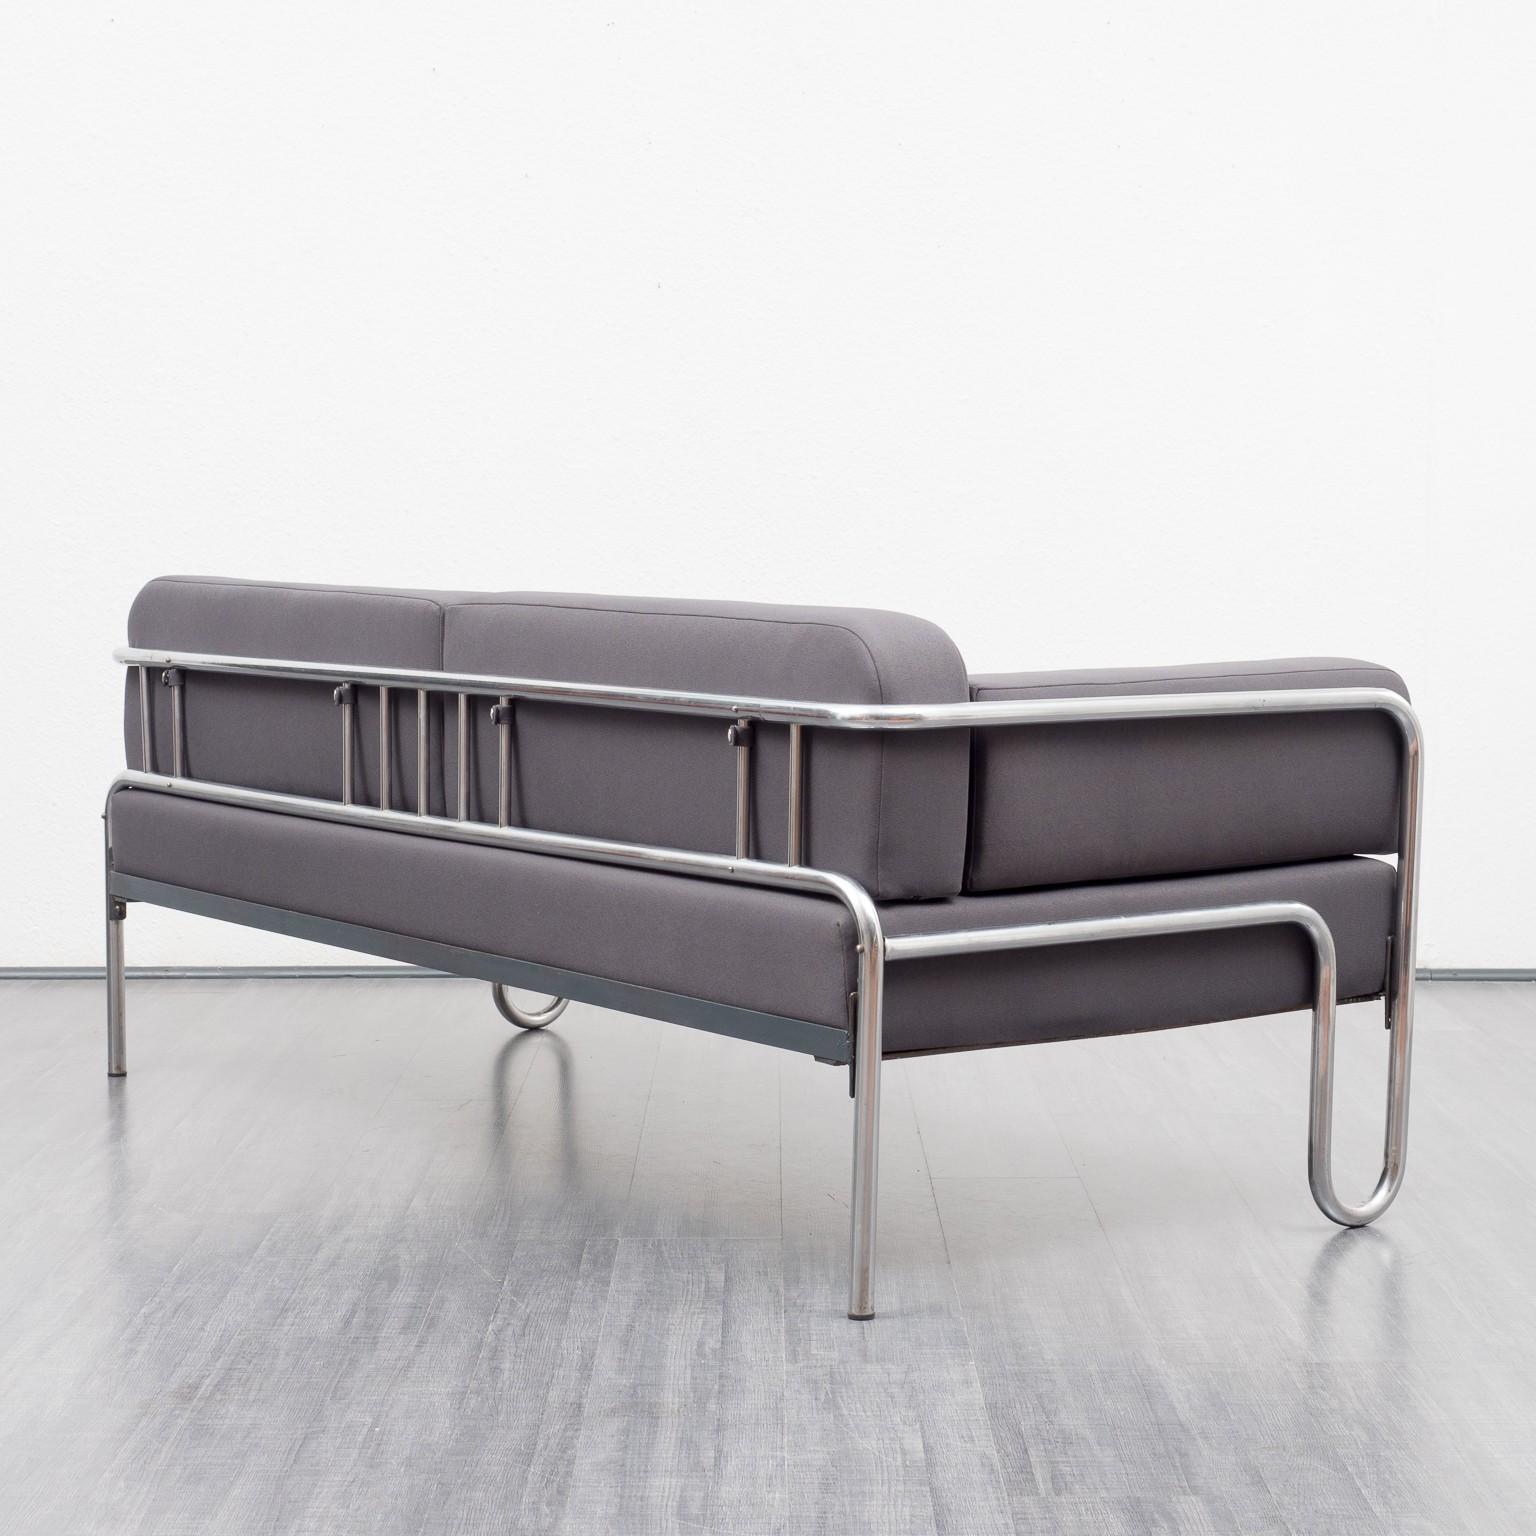 Bauhaus sofa vintage, new upholstery - 1930s - Design Market